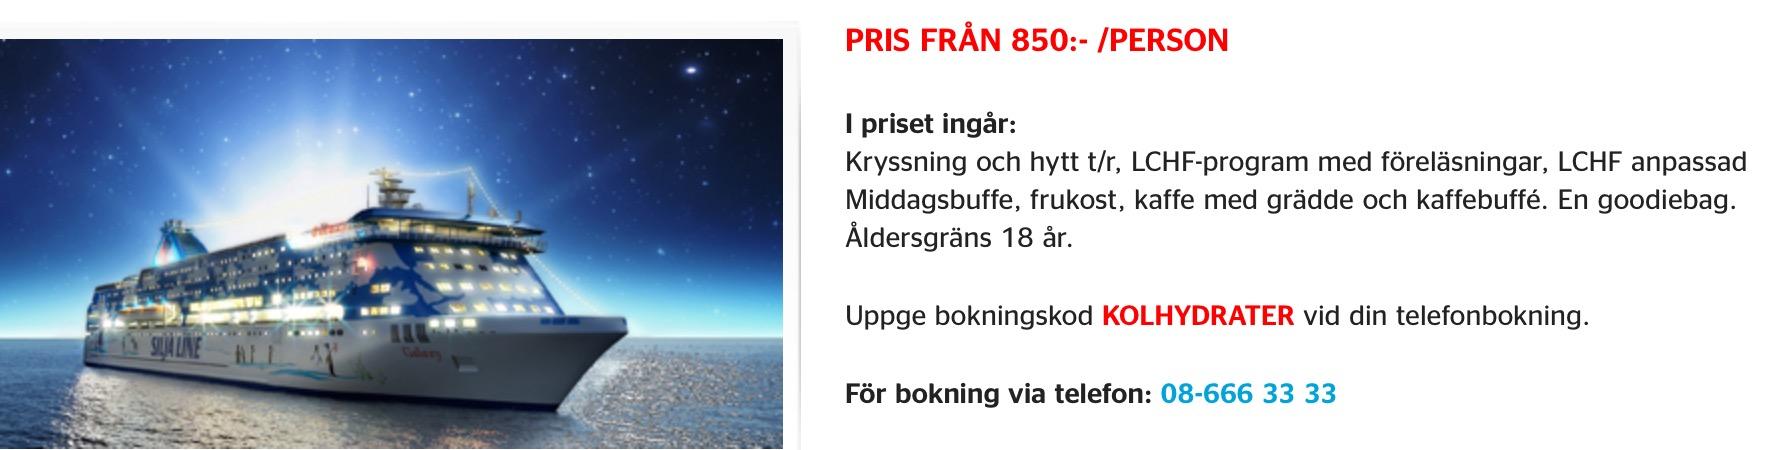 http://kolhydrater.ifokus.se/u2/e018bd9cc08274ee606255ea65c6f38c/default/img-2732.png